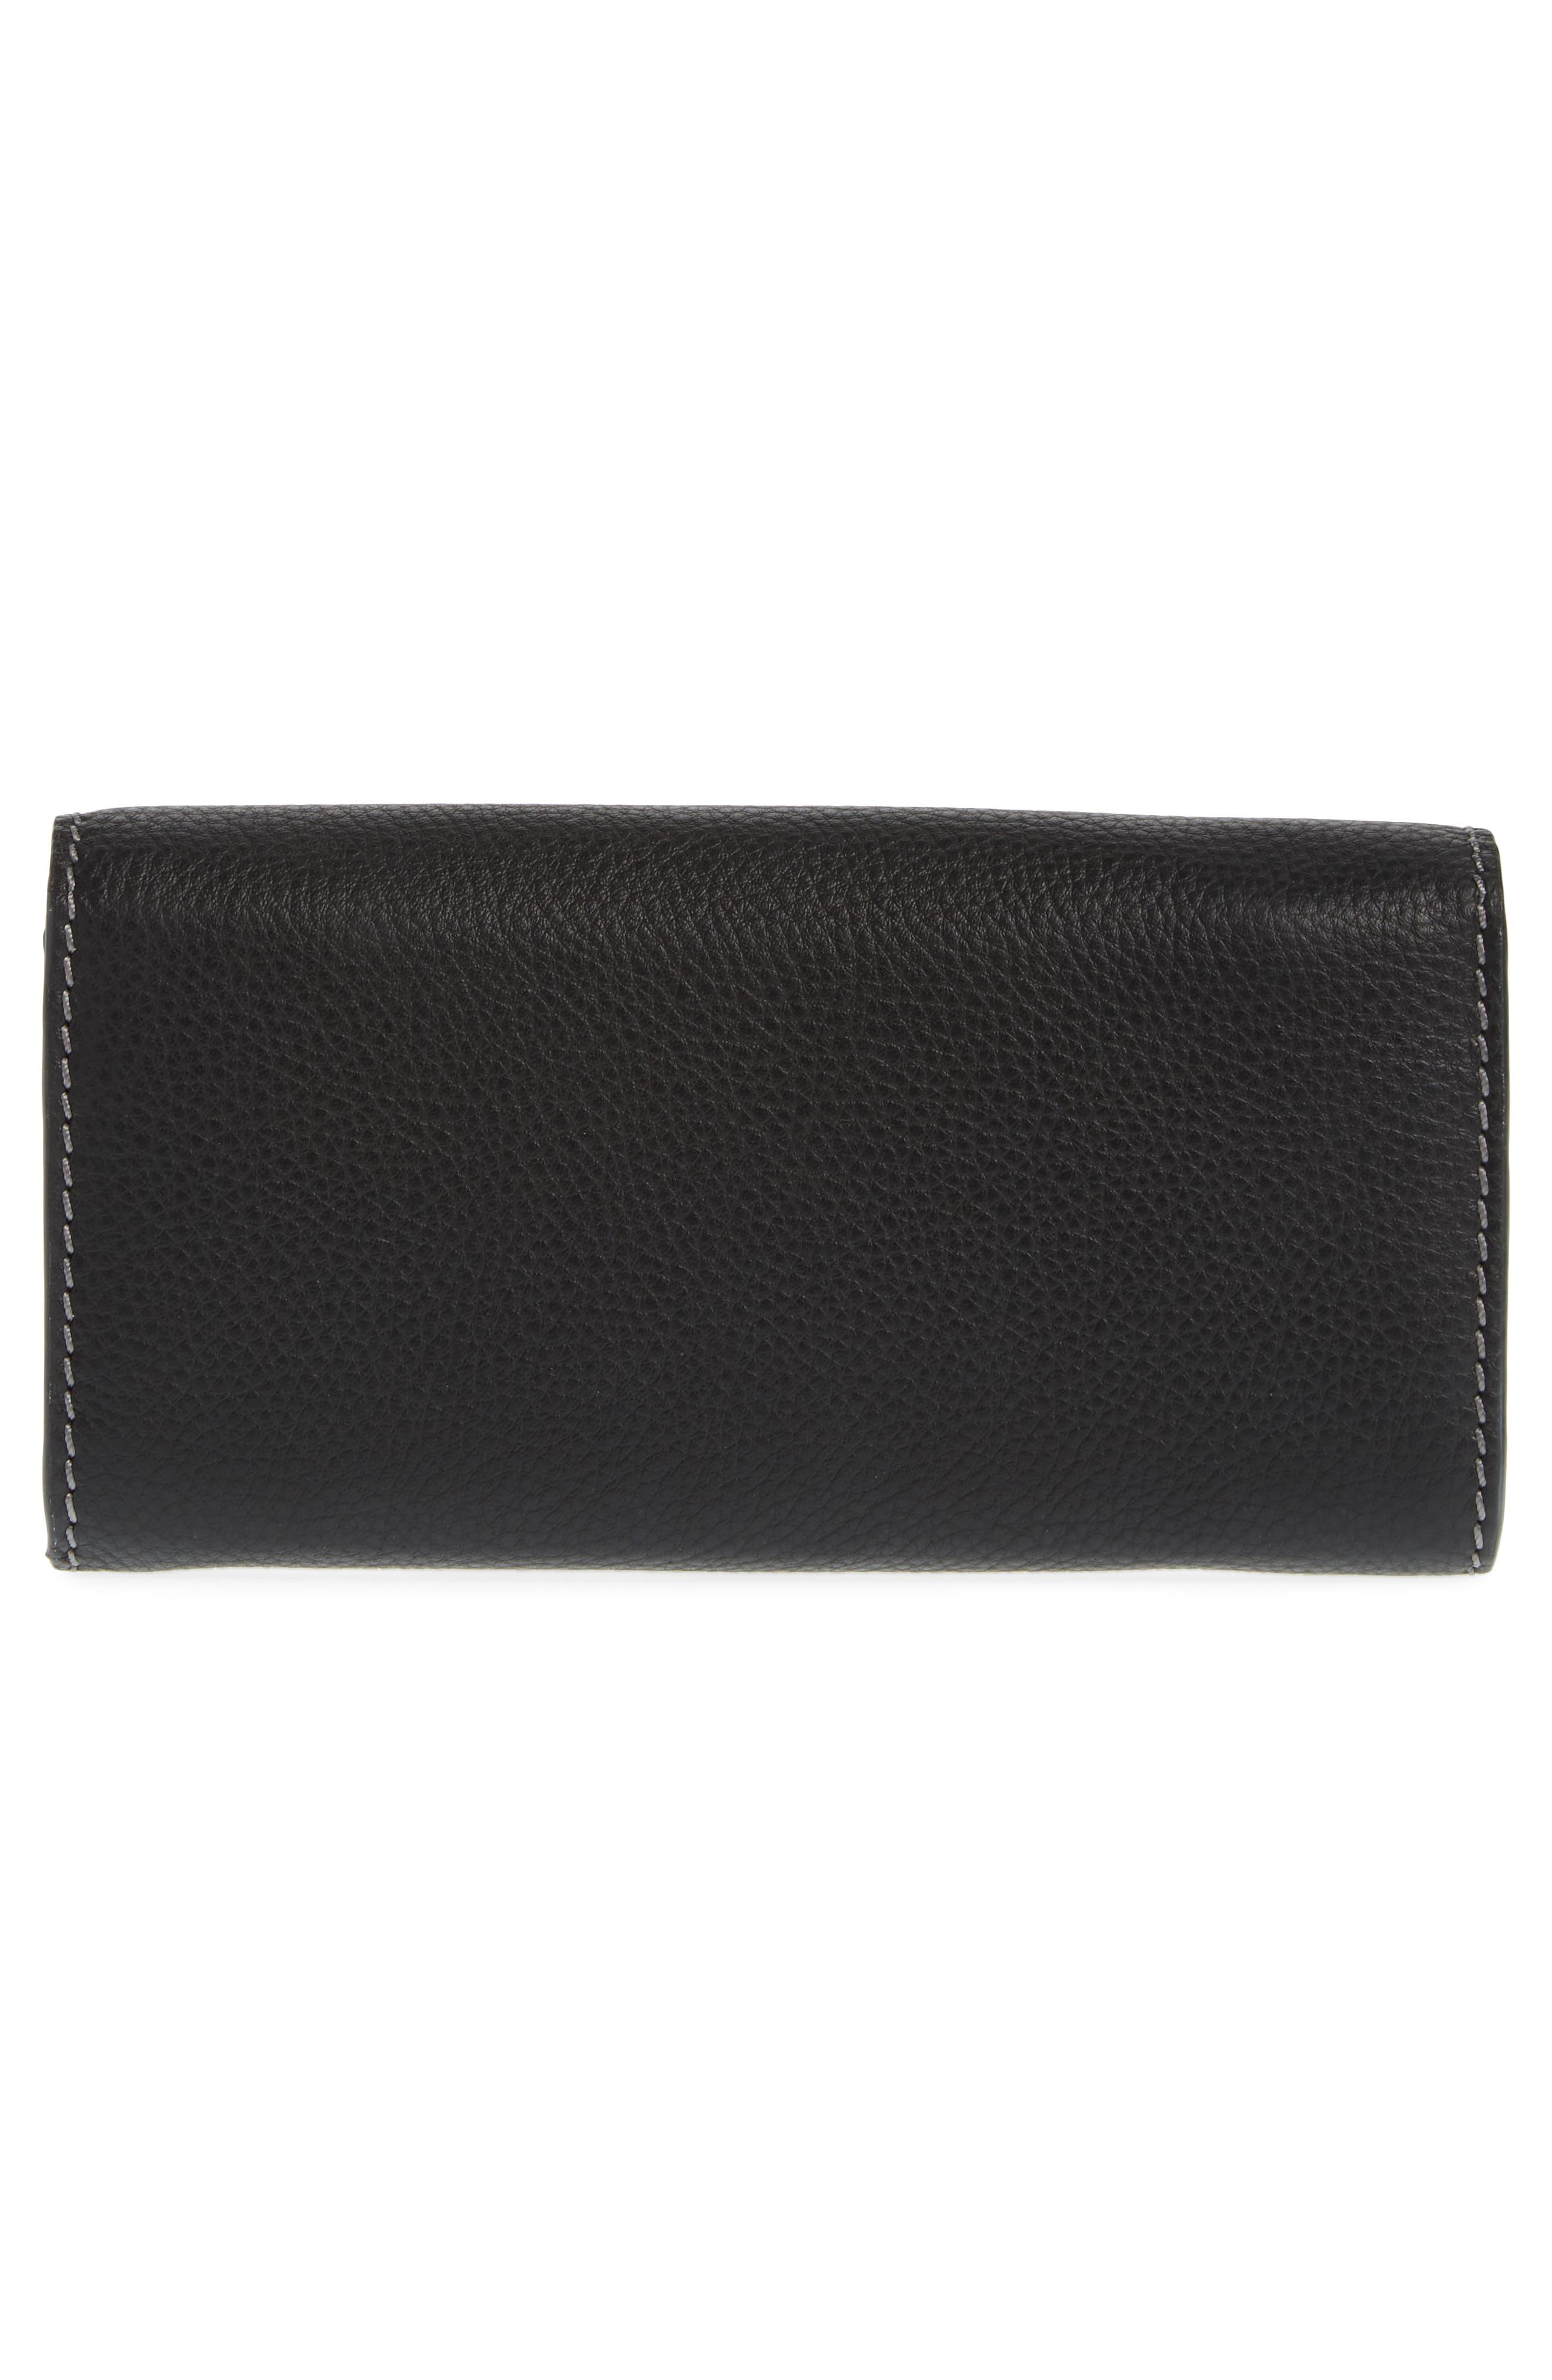 Marcie - Long Leather Flap Wallet,                             Alternate thumbnail 3, color,                             BLACK